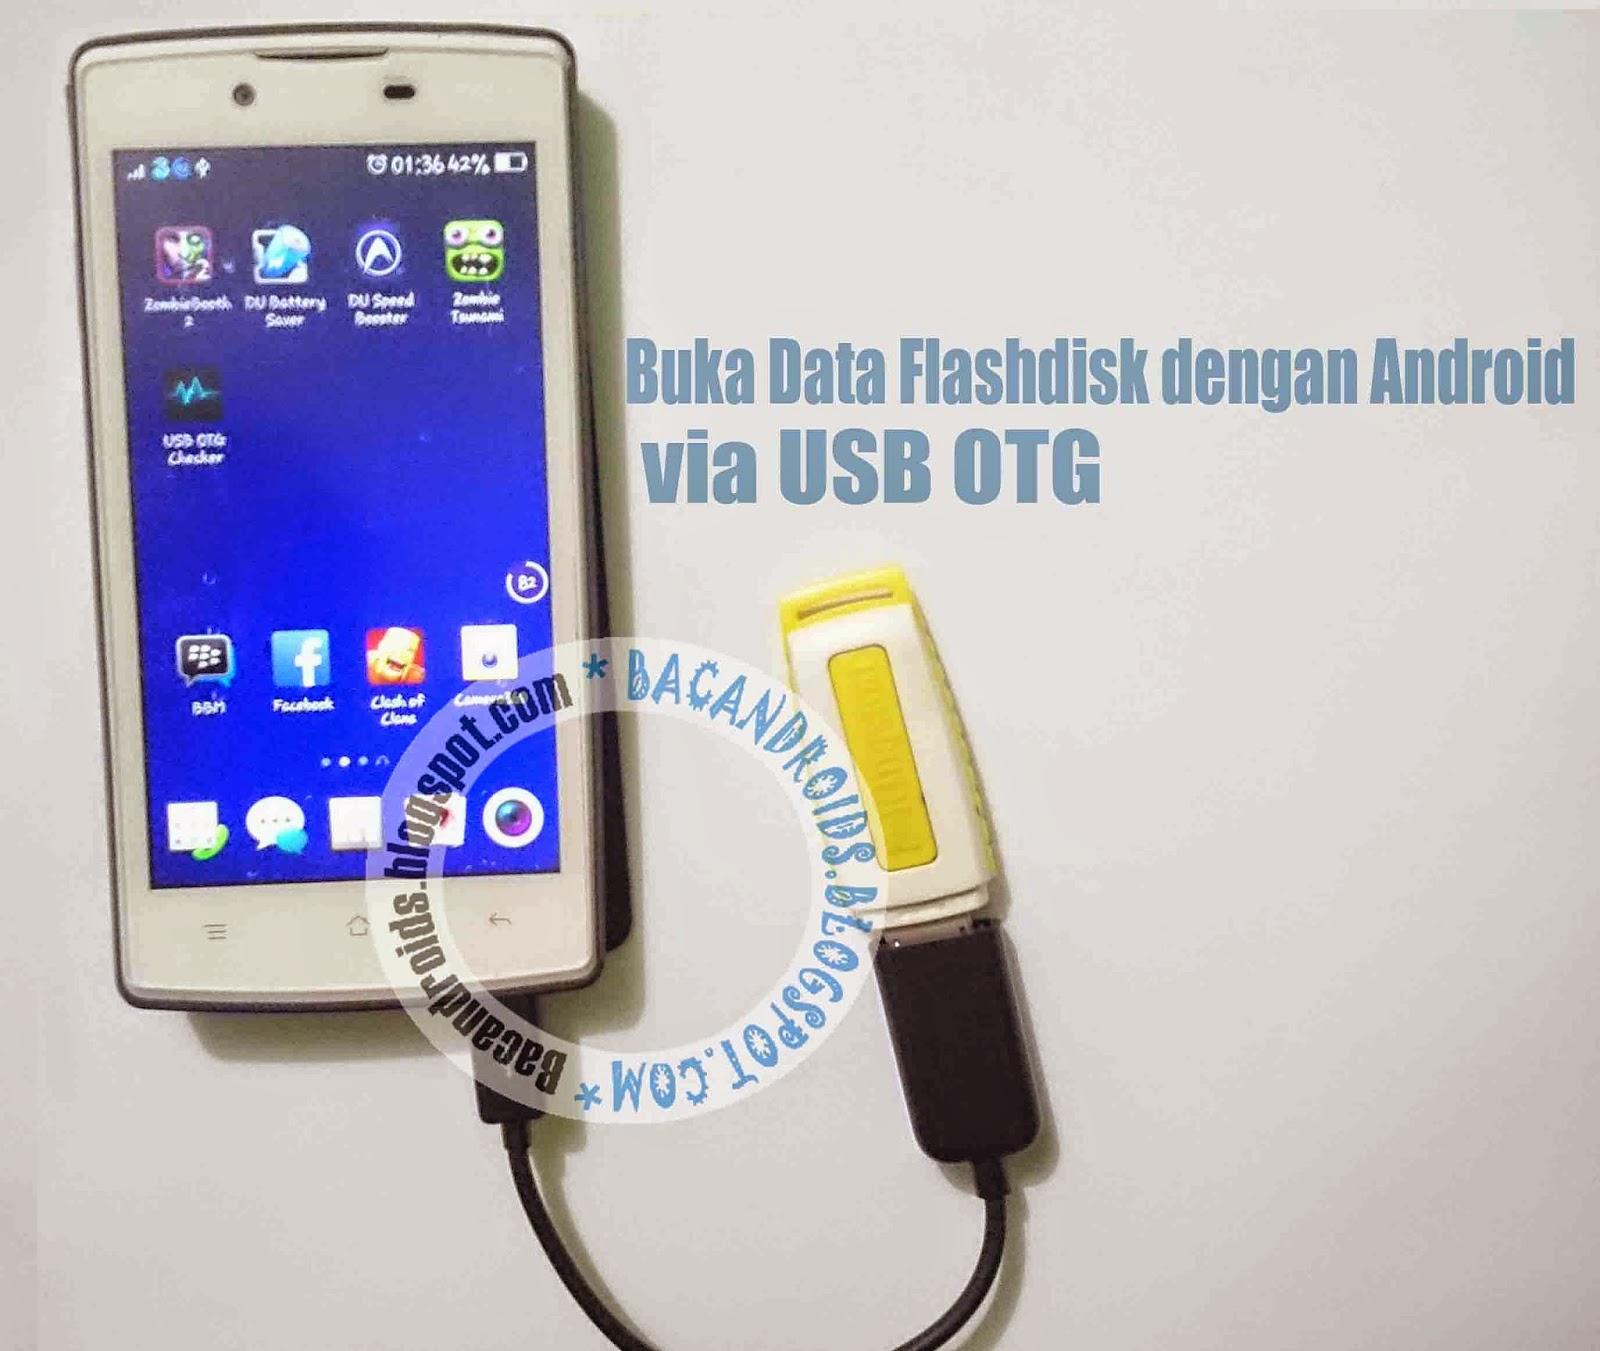 Usb OTG penggunaan Flashdisk, keyboard, mouse stick PS3 untuk android